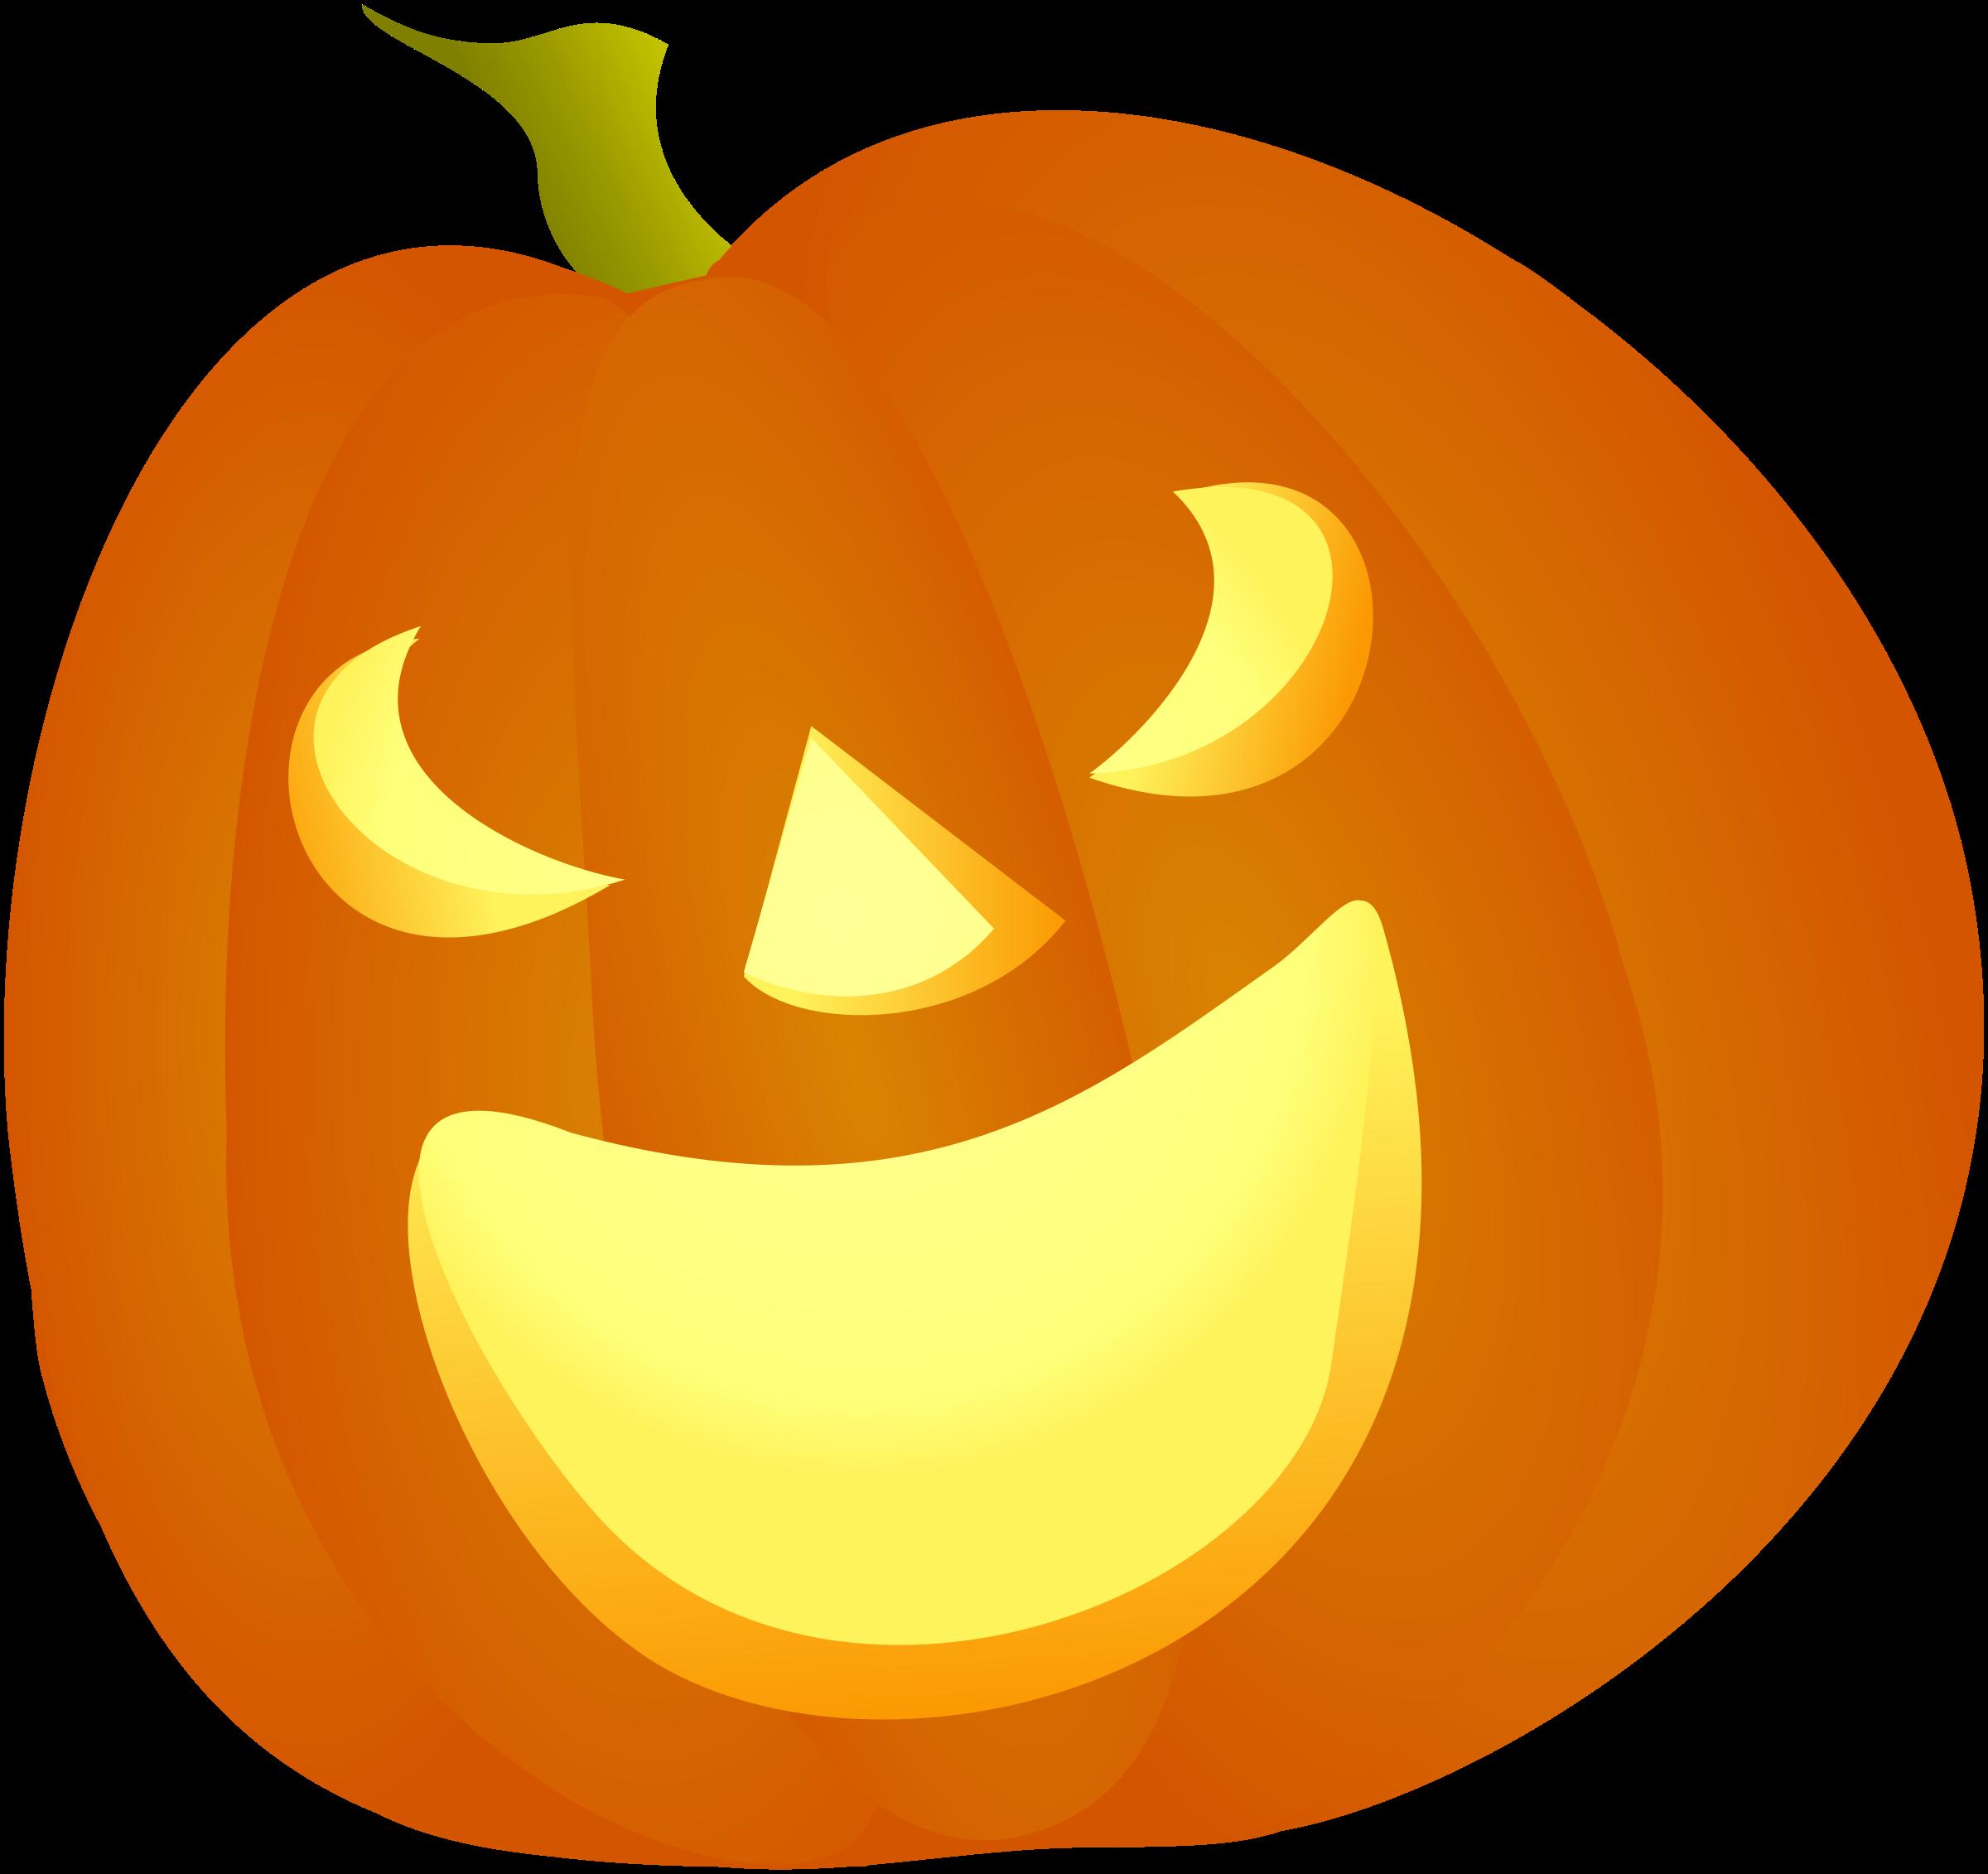 Pumpkin expressions clipart png stock Clipart - Halloween Pumpkin Smile png stock